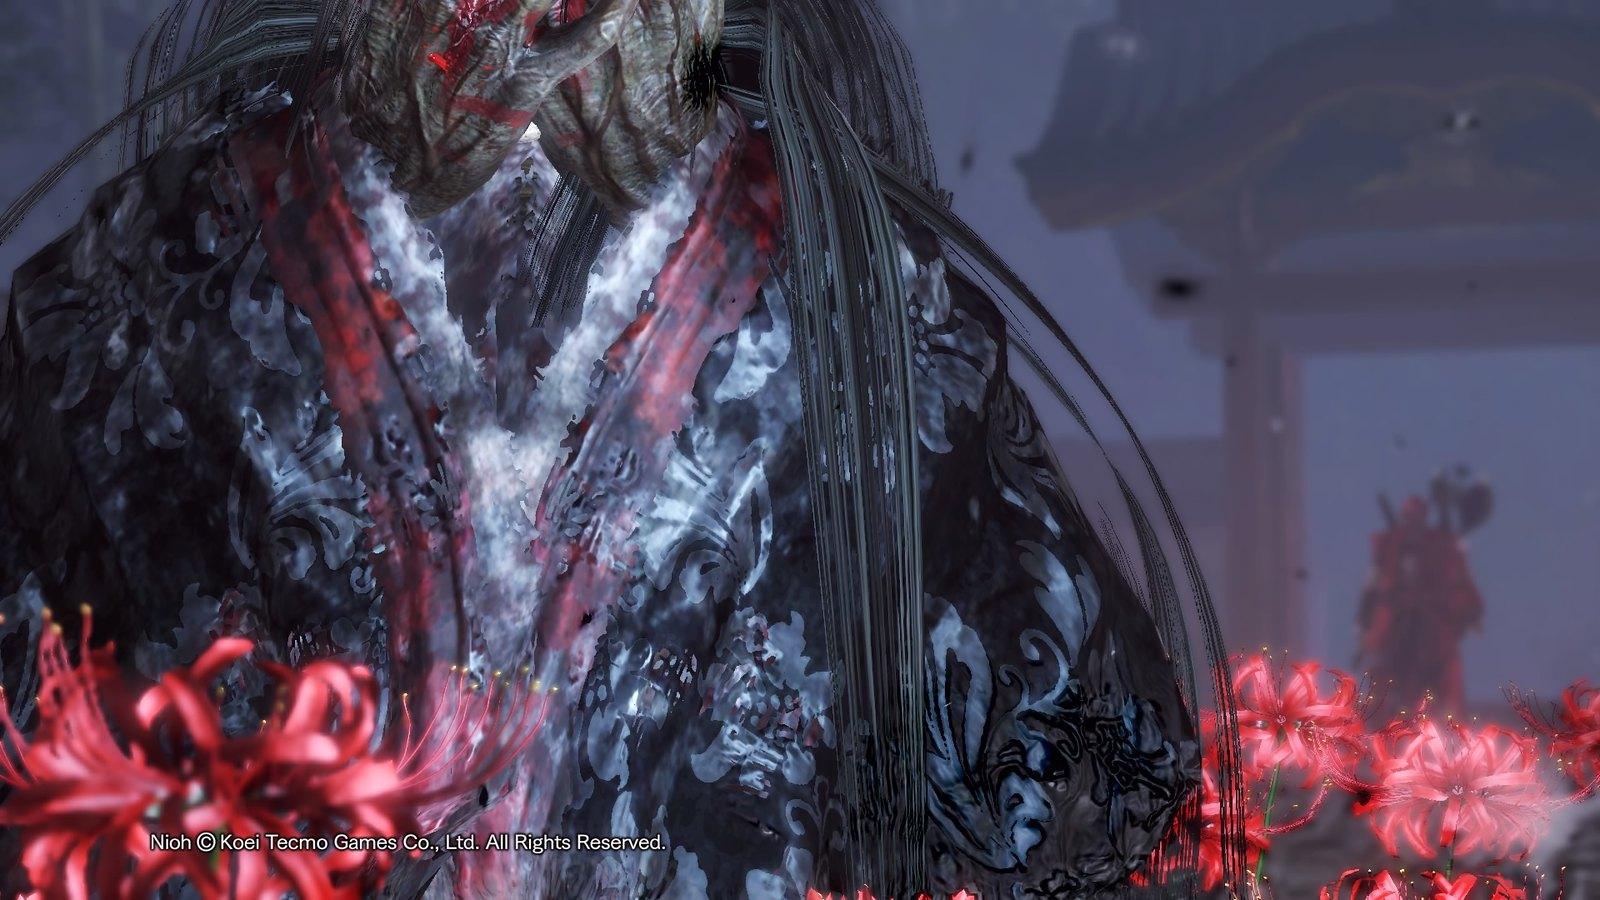 [Nioh] Mission : Memories of Death-Lillies